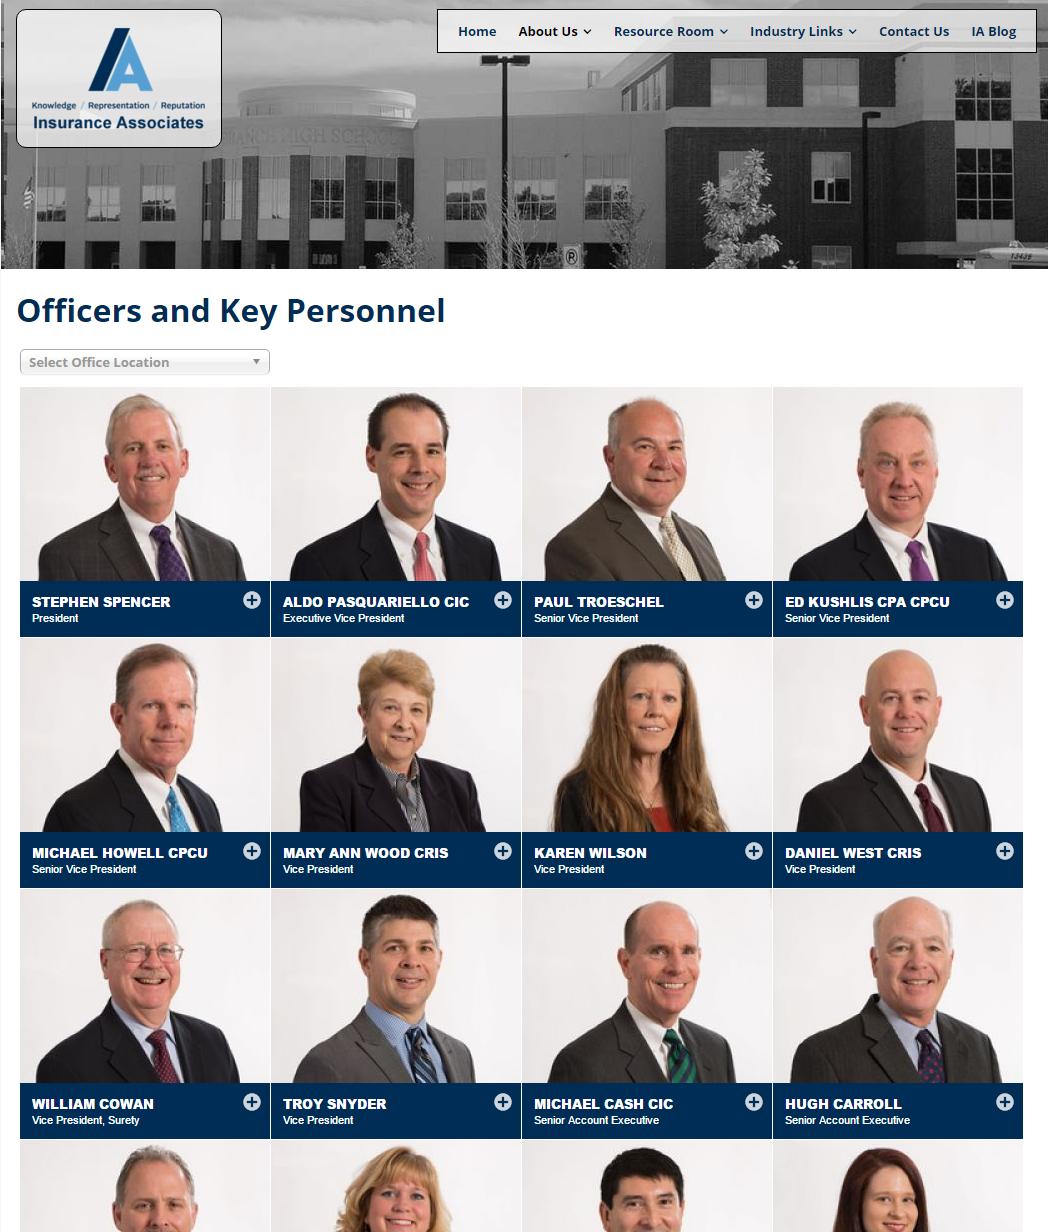 Insurance Associates